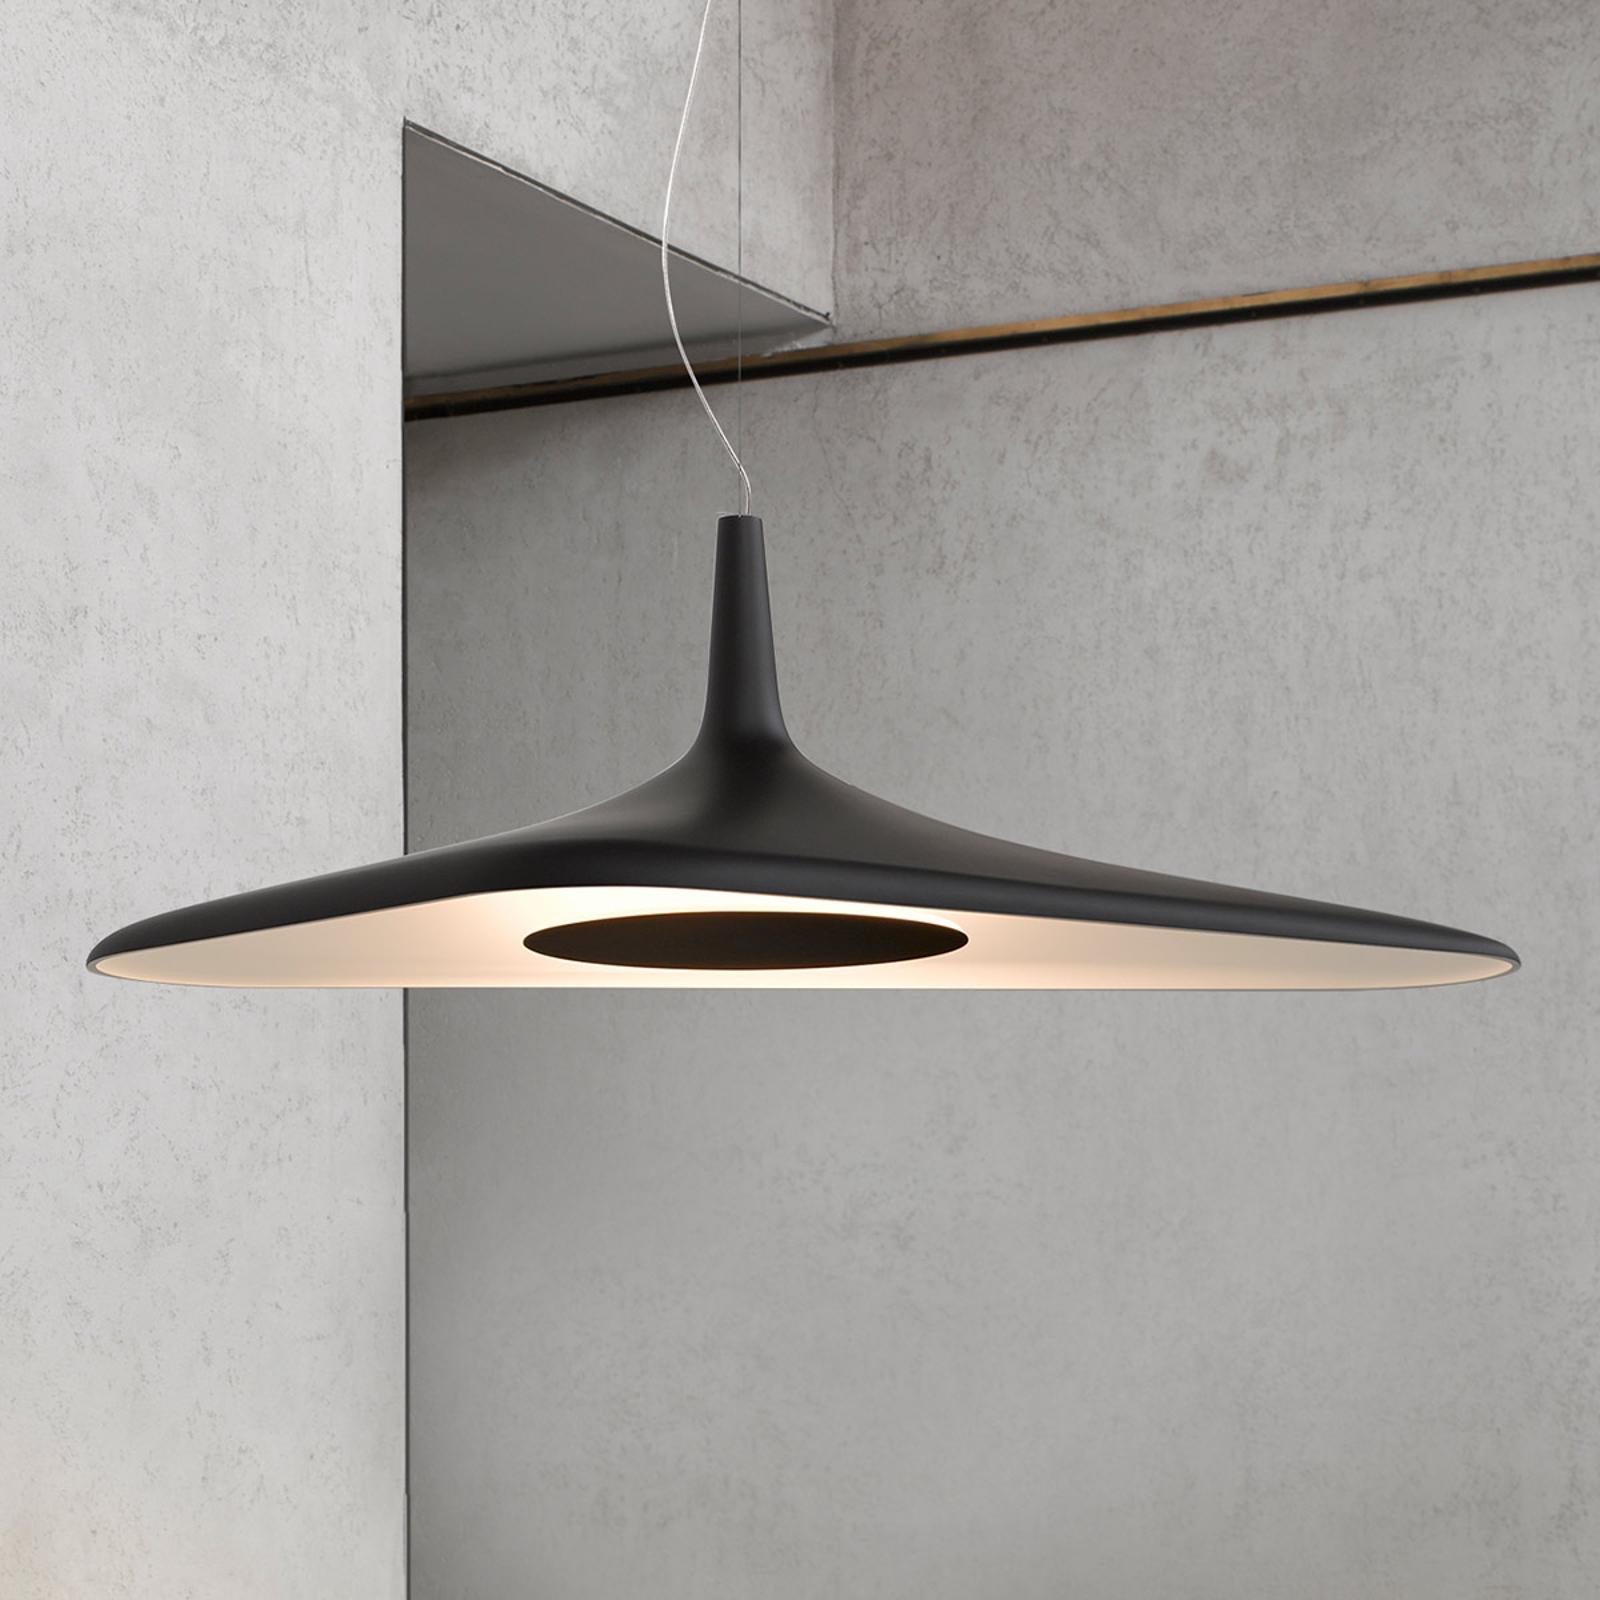 Futuristinen LED-riippuvalaisin Soleil Noir